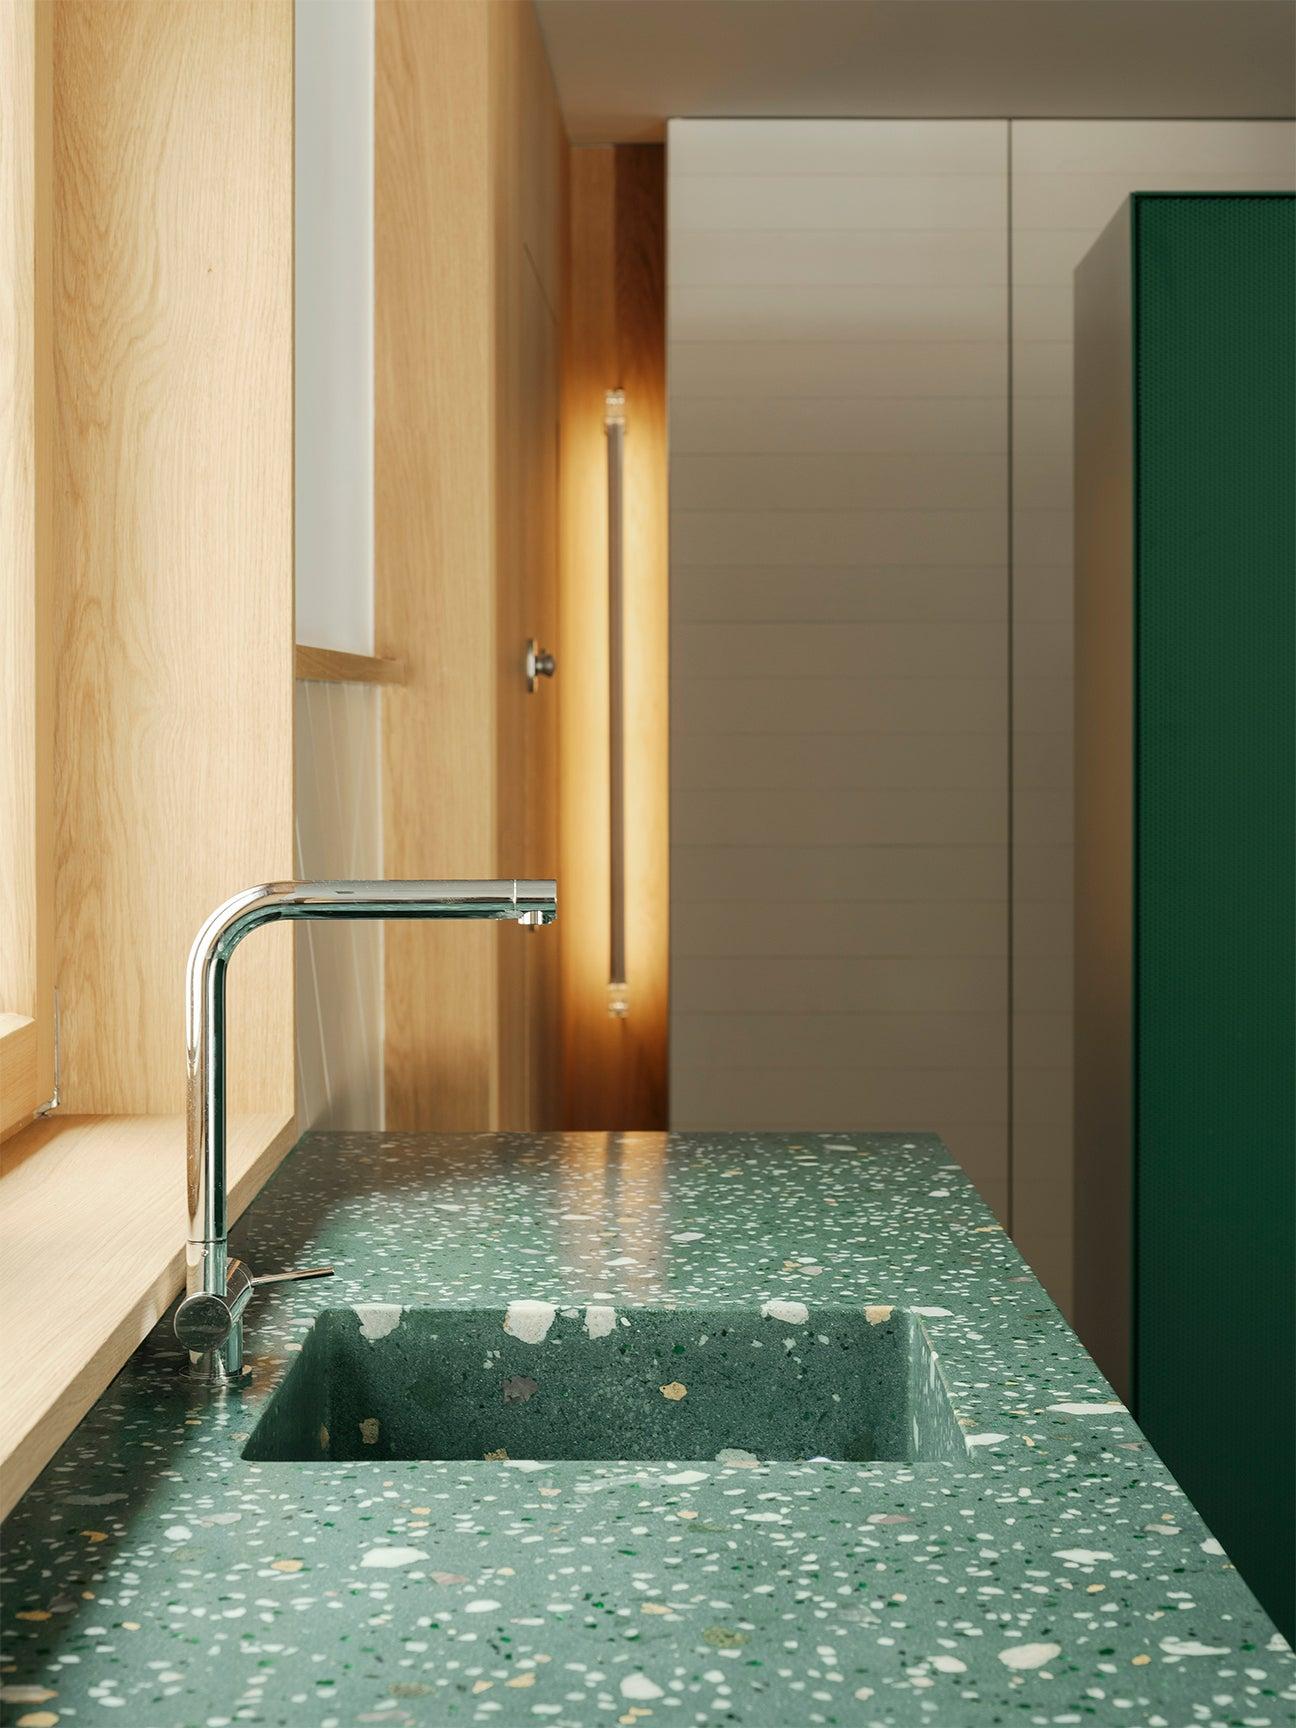 terrazzo green sink